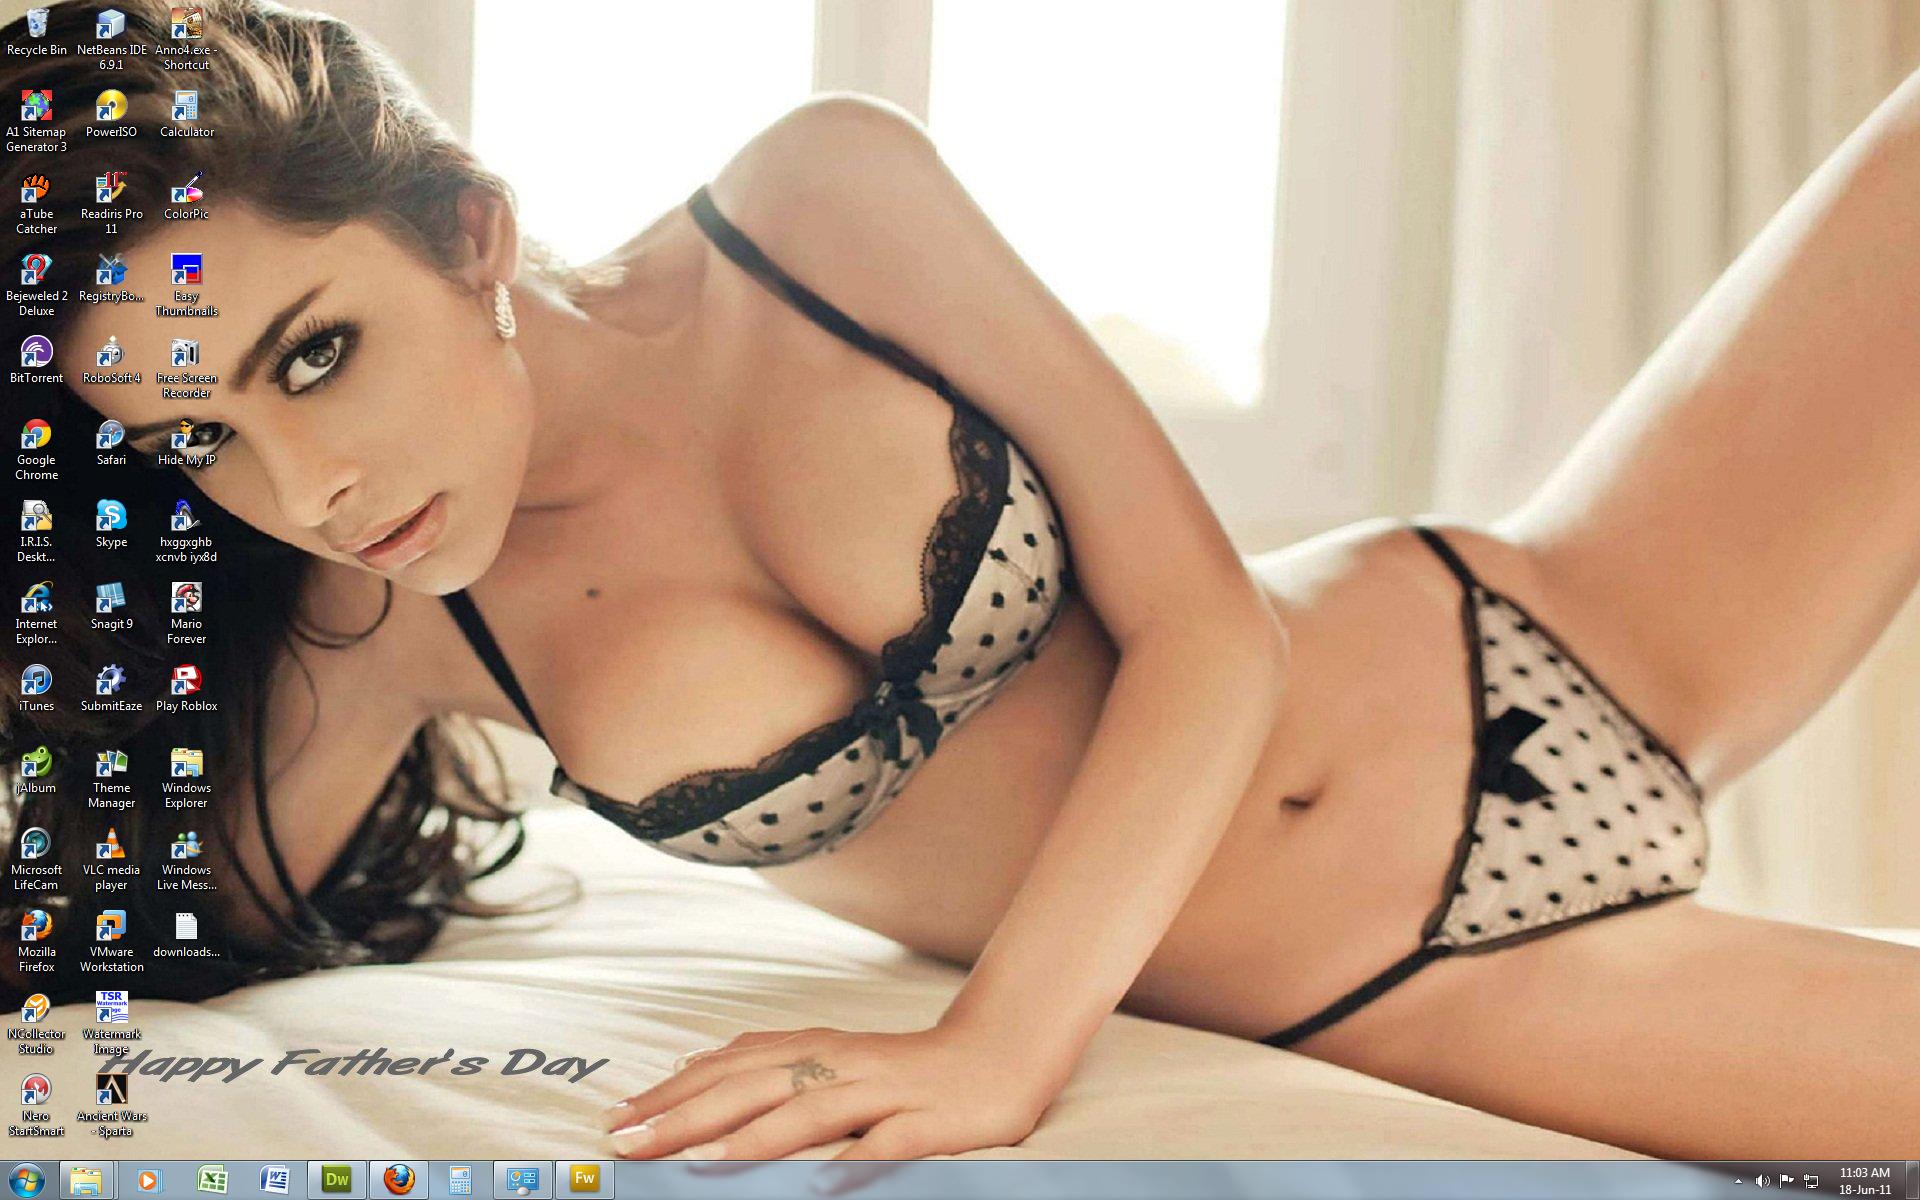 Windows 7 Themes Babes